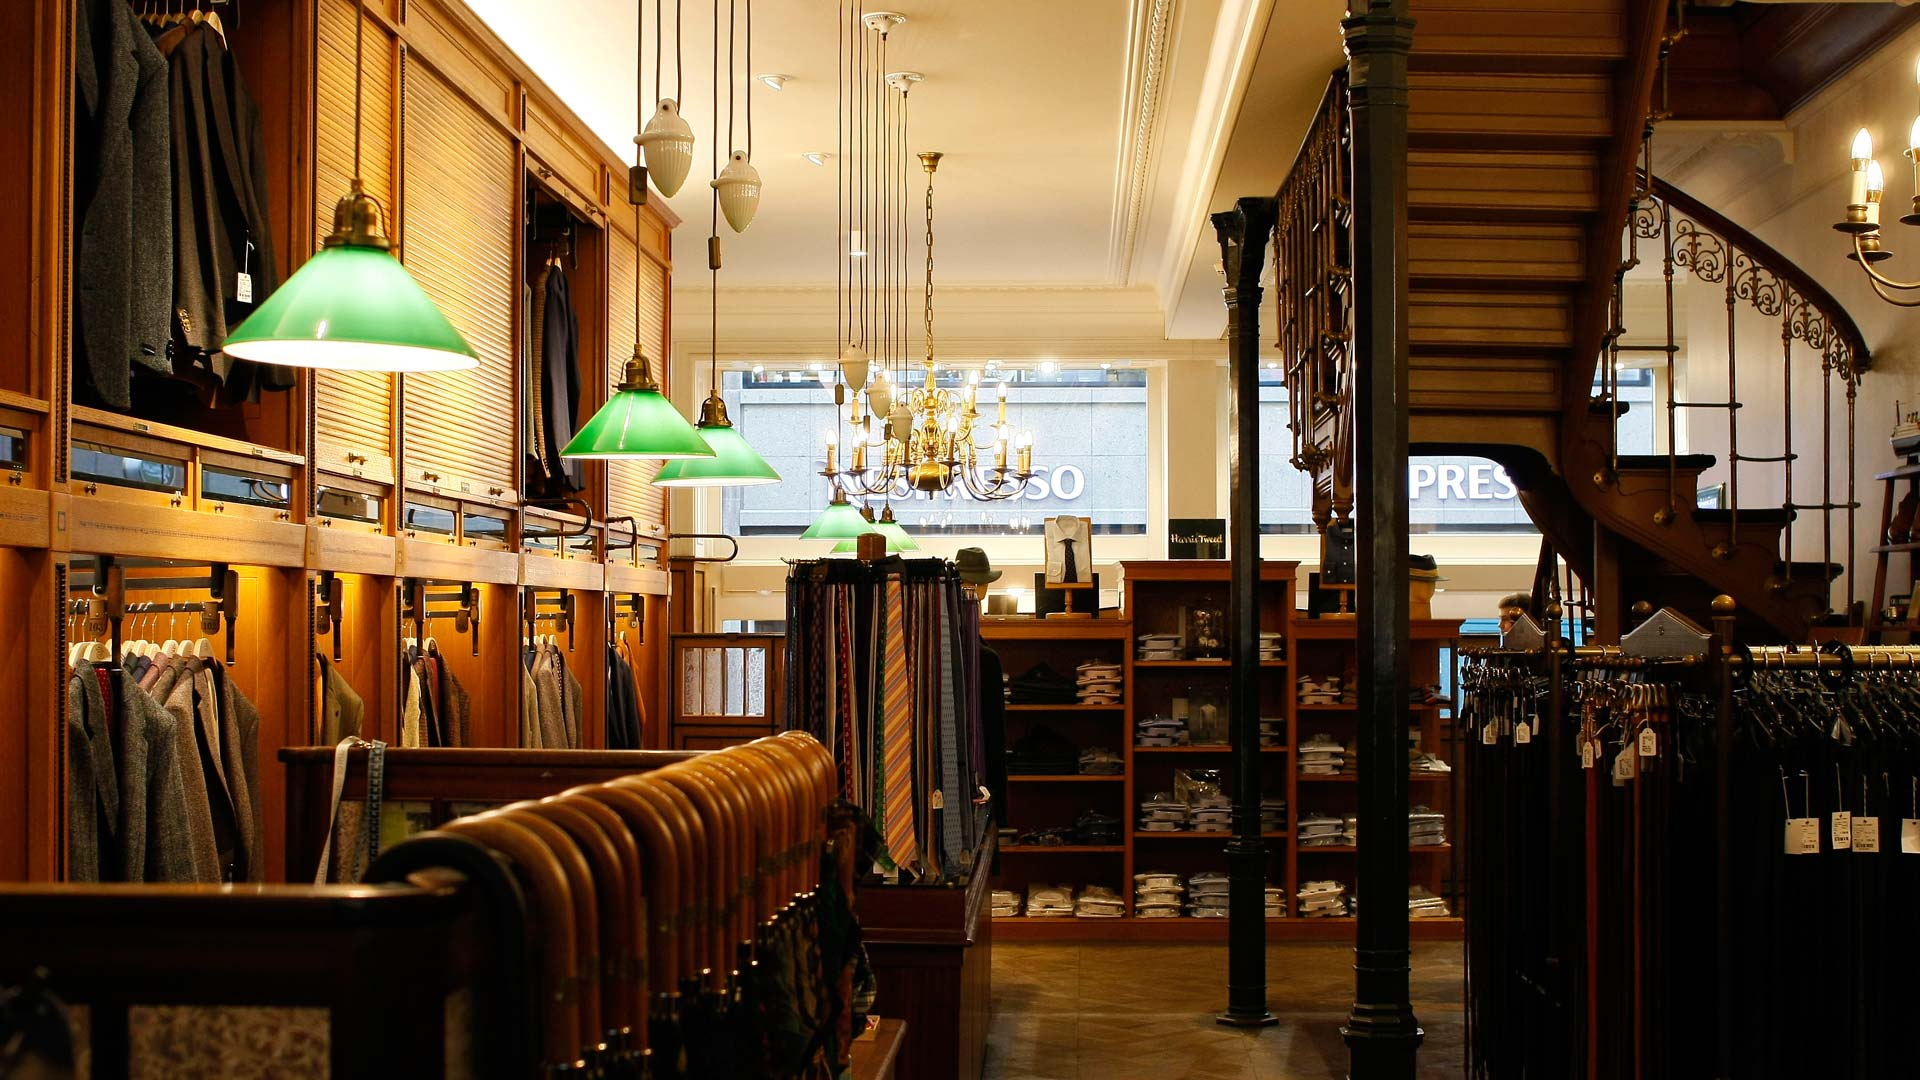 MAASS-Lichtplanung_Shopbeleuchtung eines Traditionsunternehmens in Hamburg__MAASS-Shop-Ladage-Oelke-012